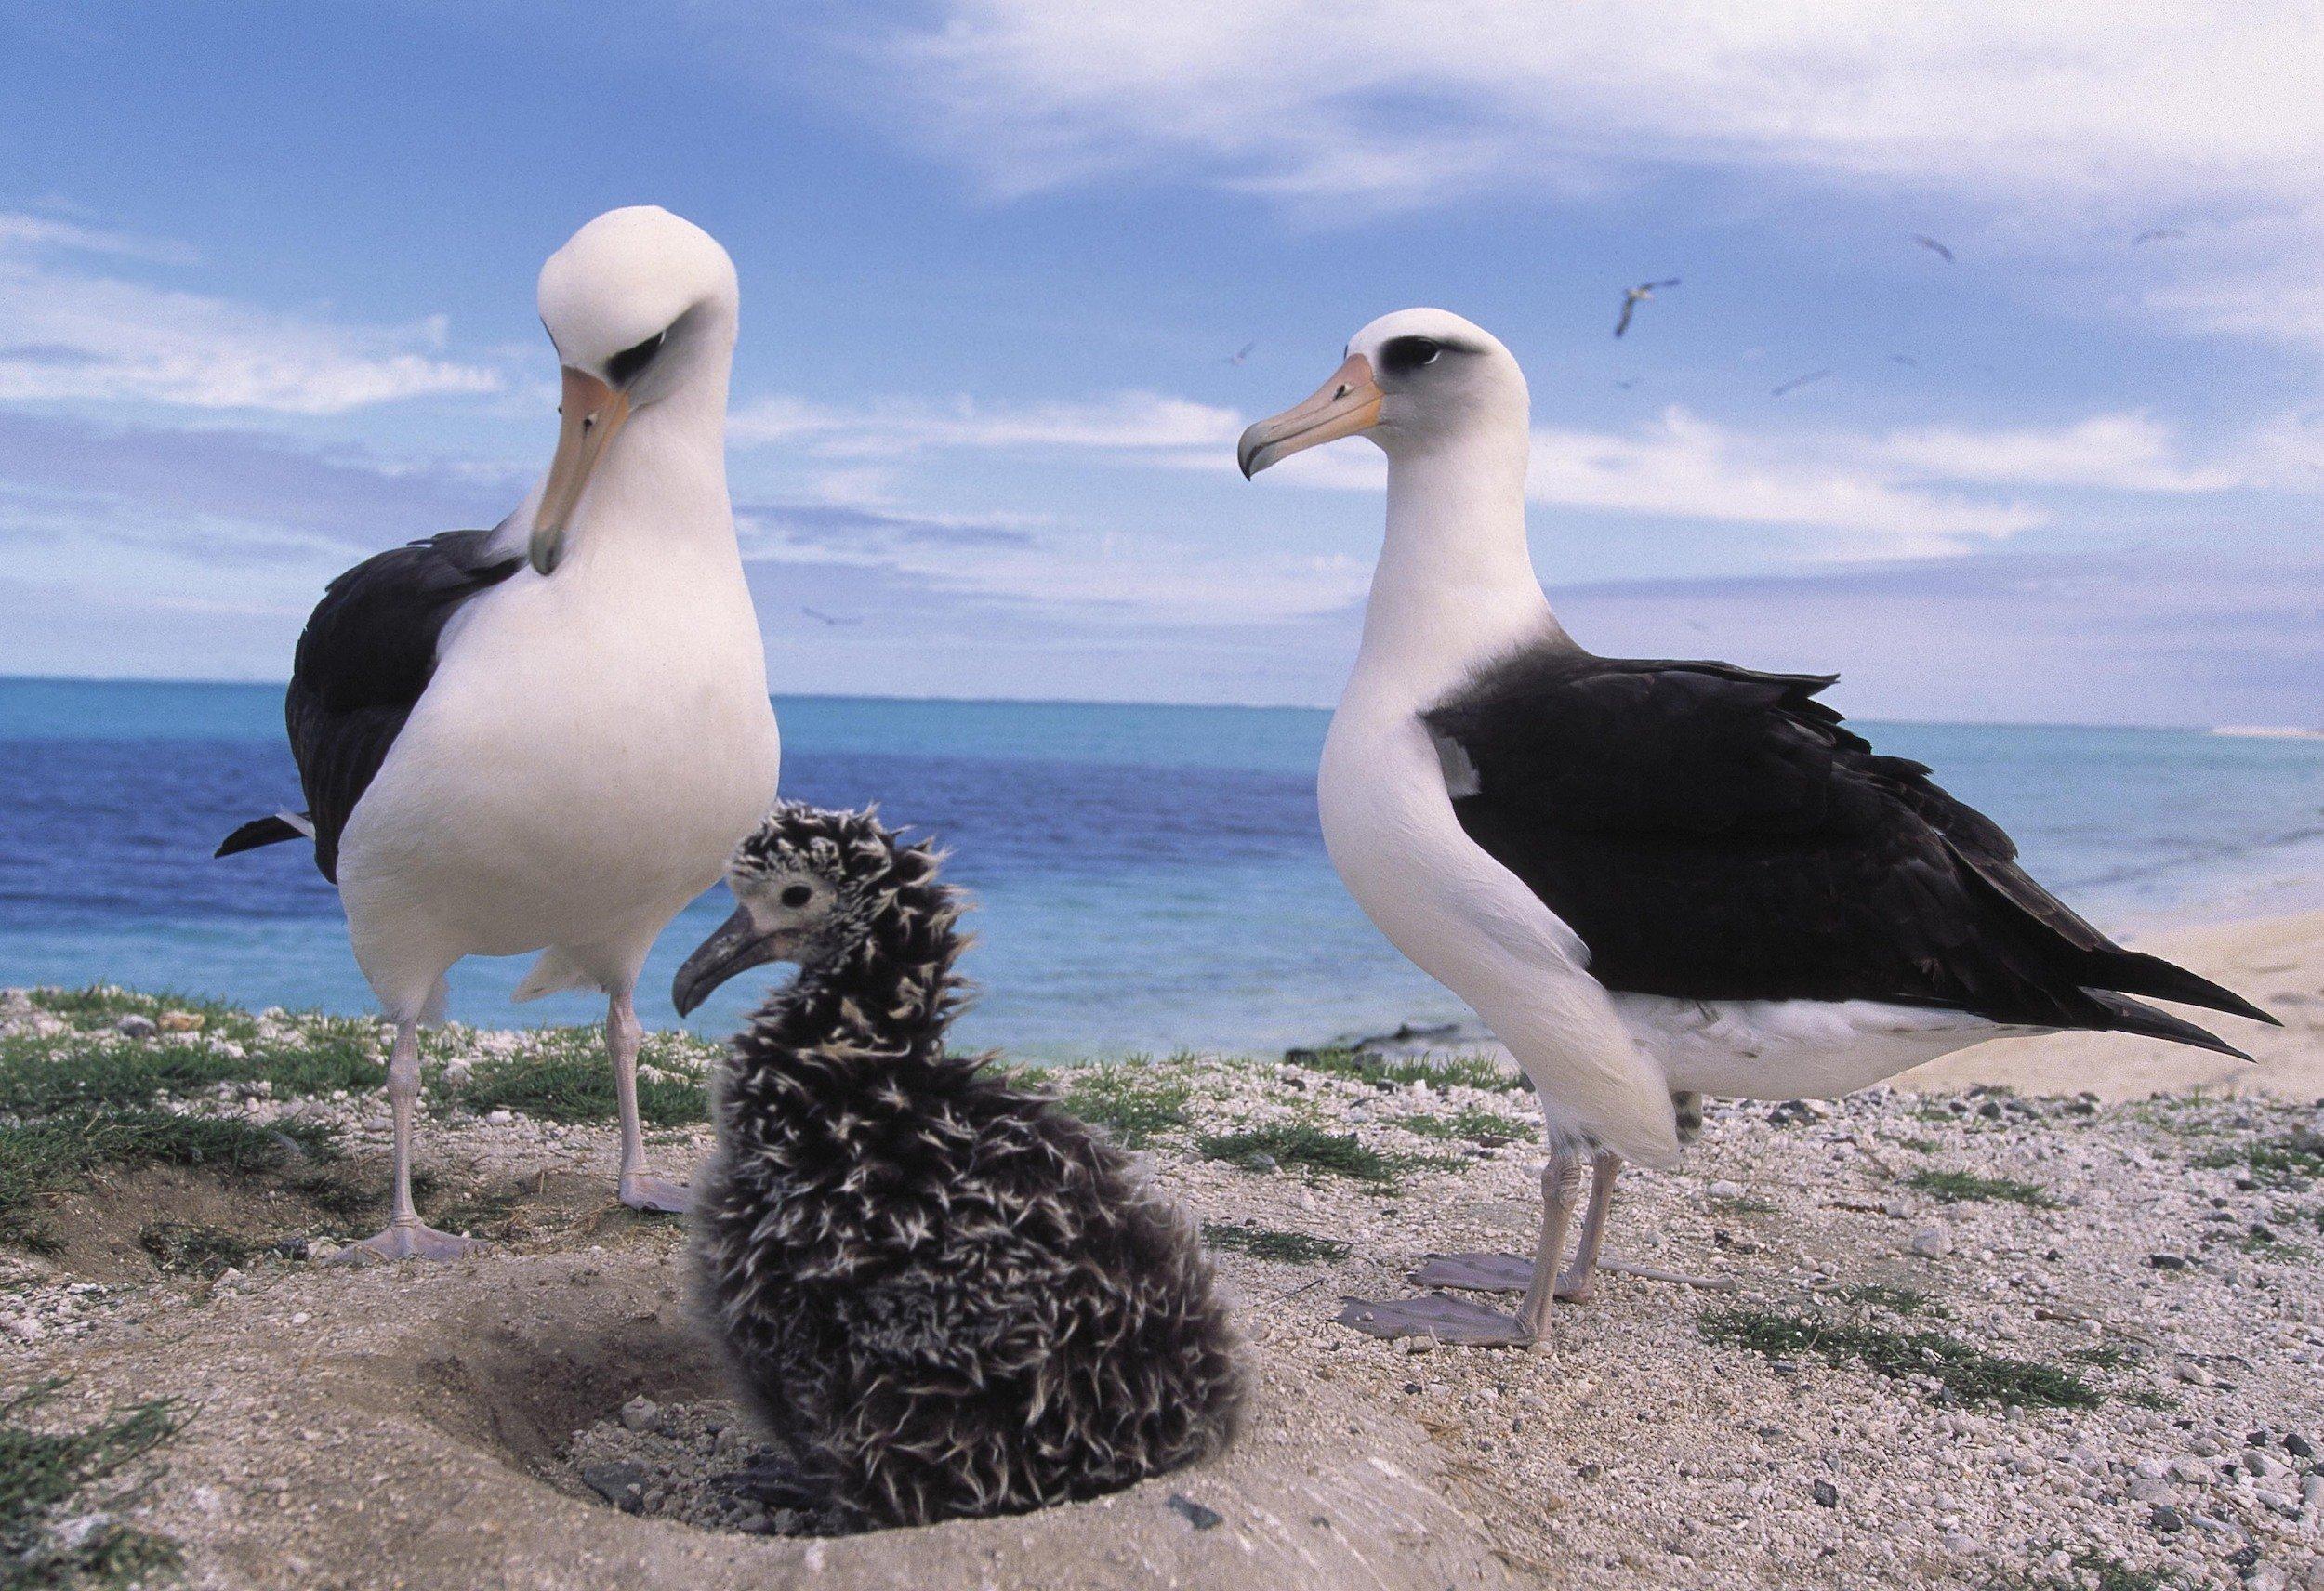 Foto zeigt eine Albatross.Familie auf Hawaii im Meeresschutzgebiet  Papah?naumoku?kea (ausgesprochen: Papa-ha-now-moh-koo-ah-kay-ah